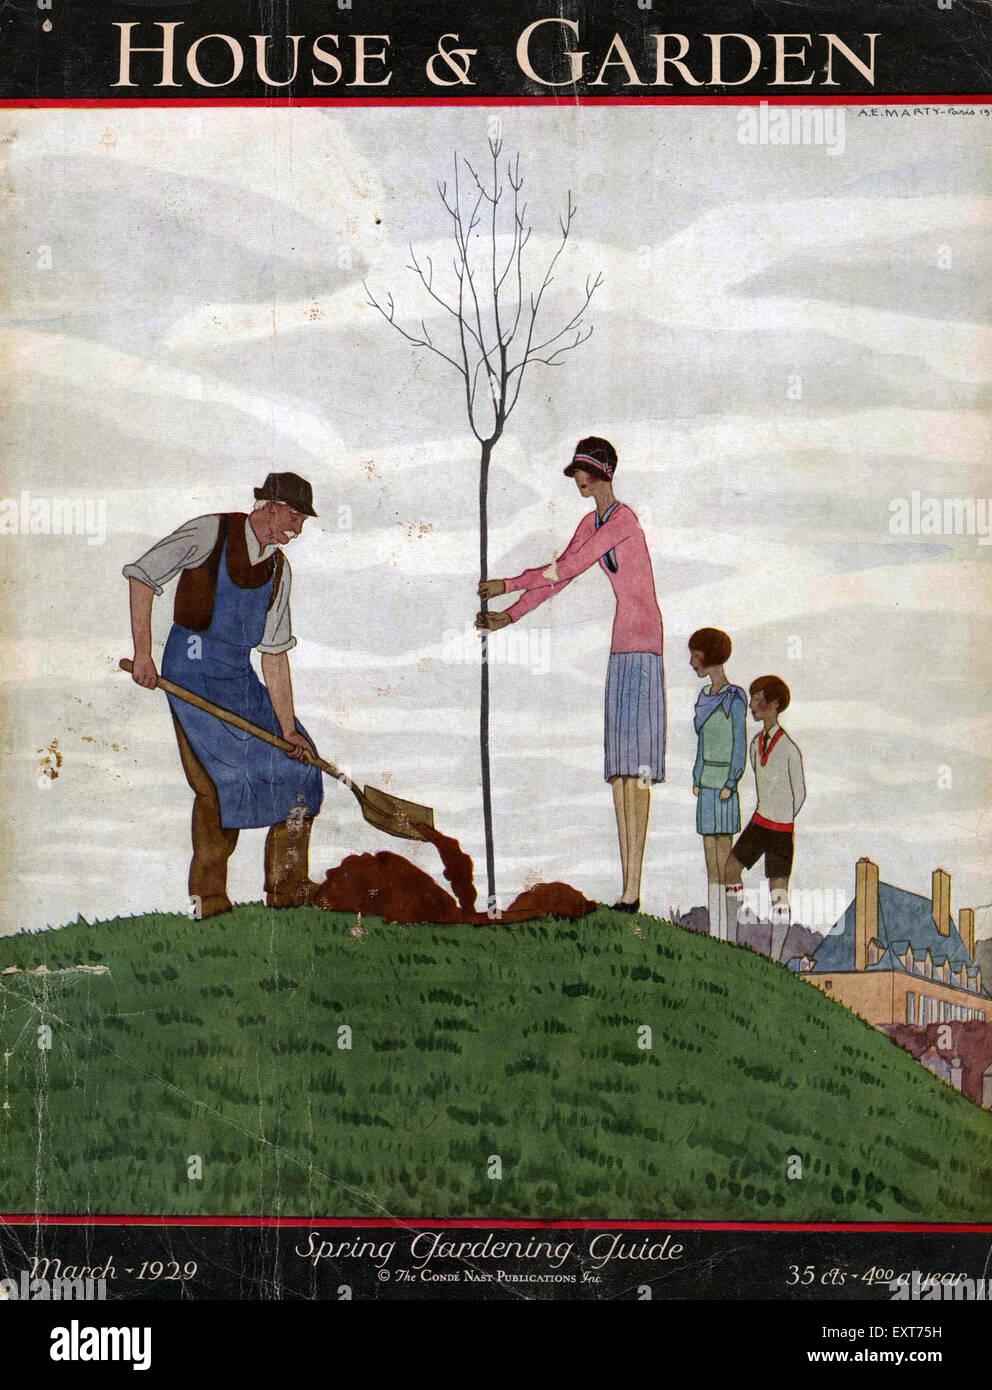 1920s Uk House And Garden Magazine Cover Stock Photo 85355021 Alamy